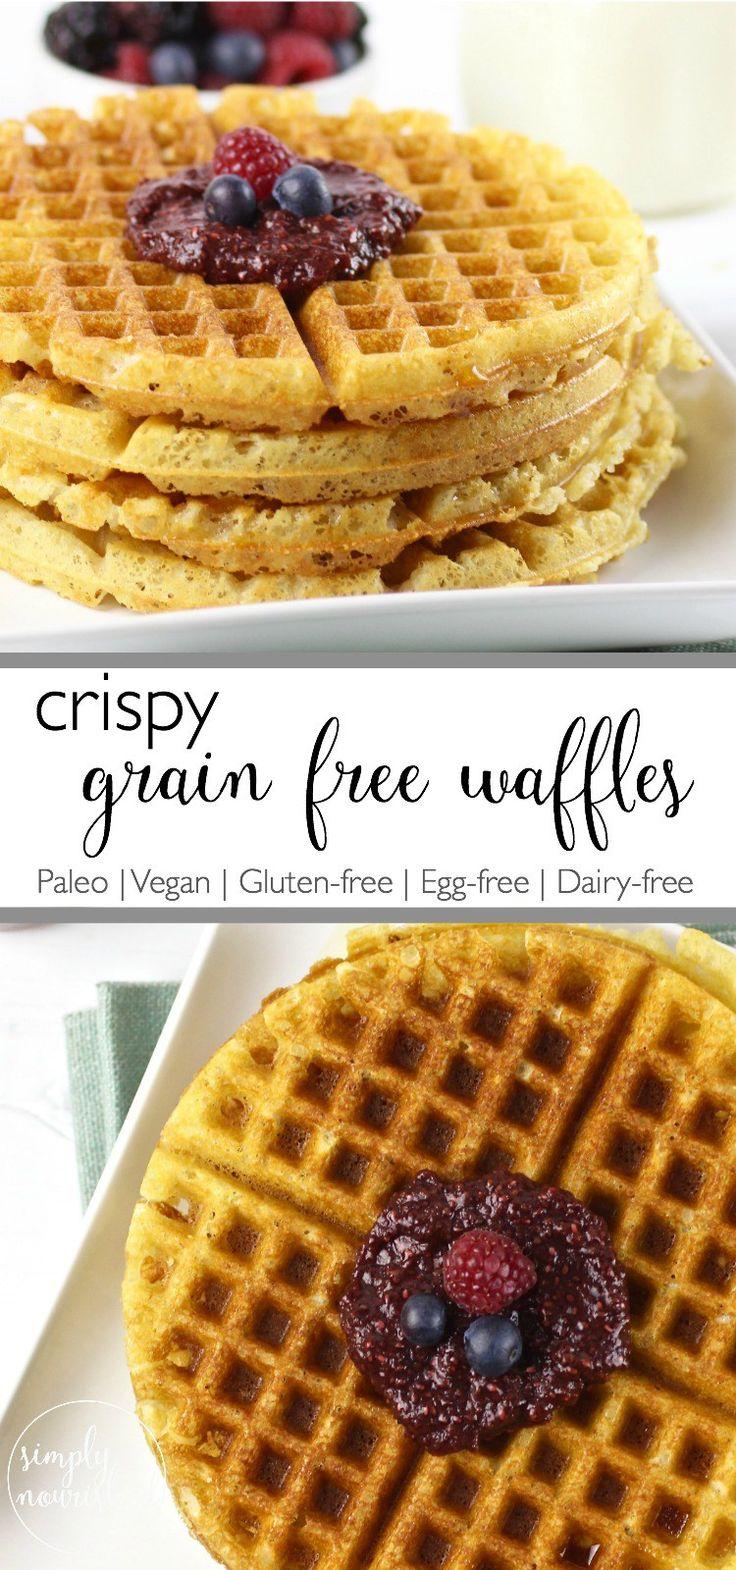 Crispy Grain-free Waffles | Say good-bye to tasteless frozen waffles from a box and helllllooooo to the crispy grain-free waffles of your breakfast dreams | Paleo | Vegan | Gluten-Free |